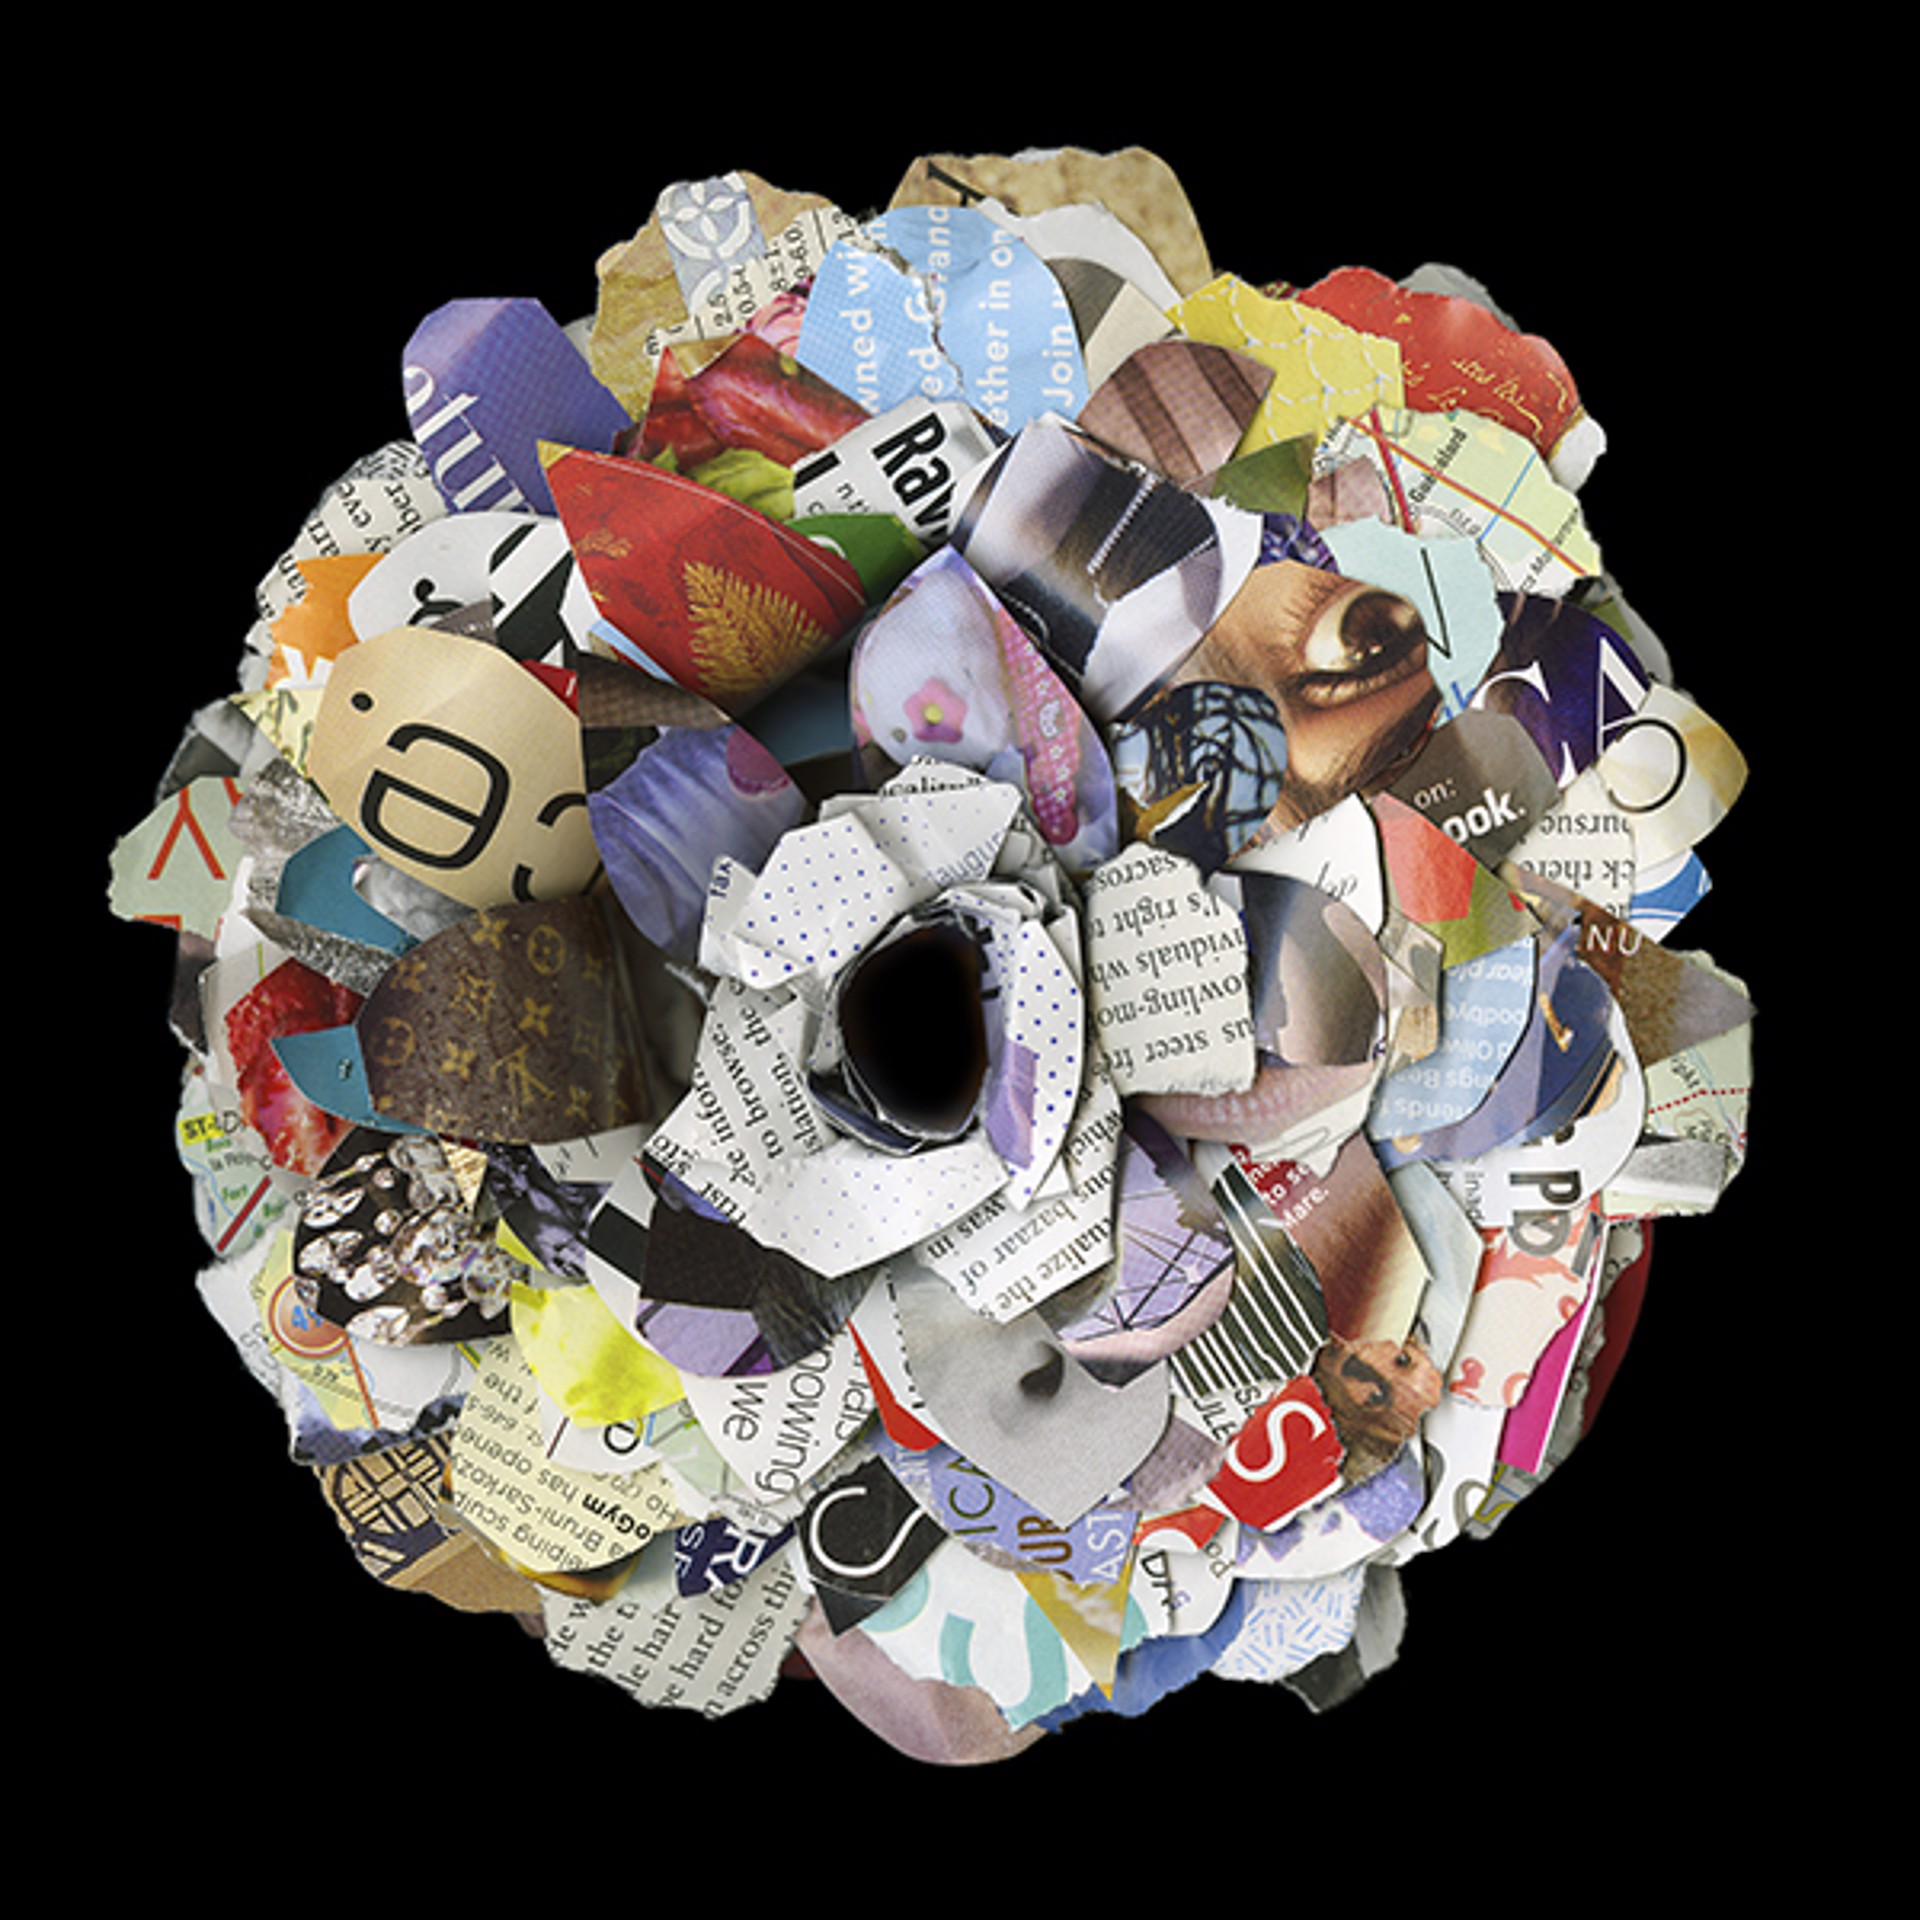 Detritus Recycled by Cara Barer